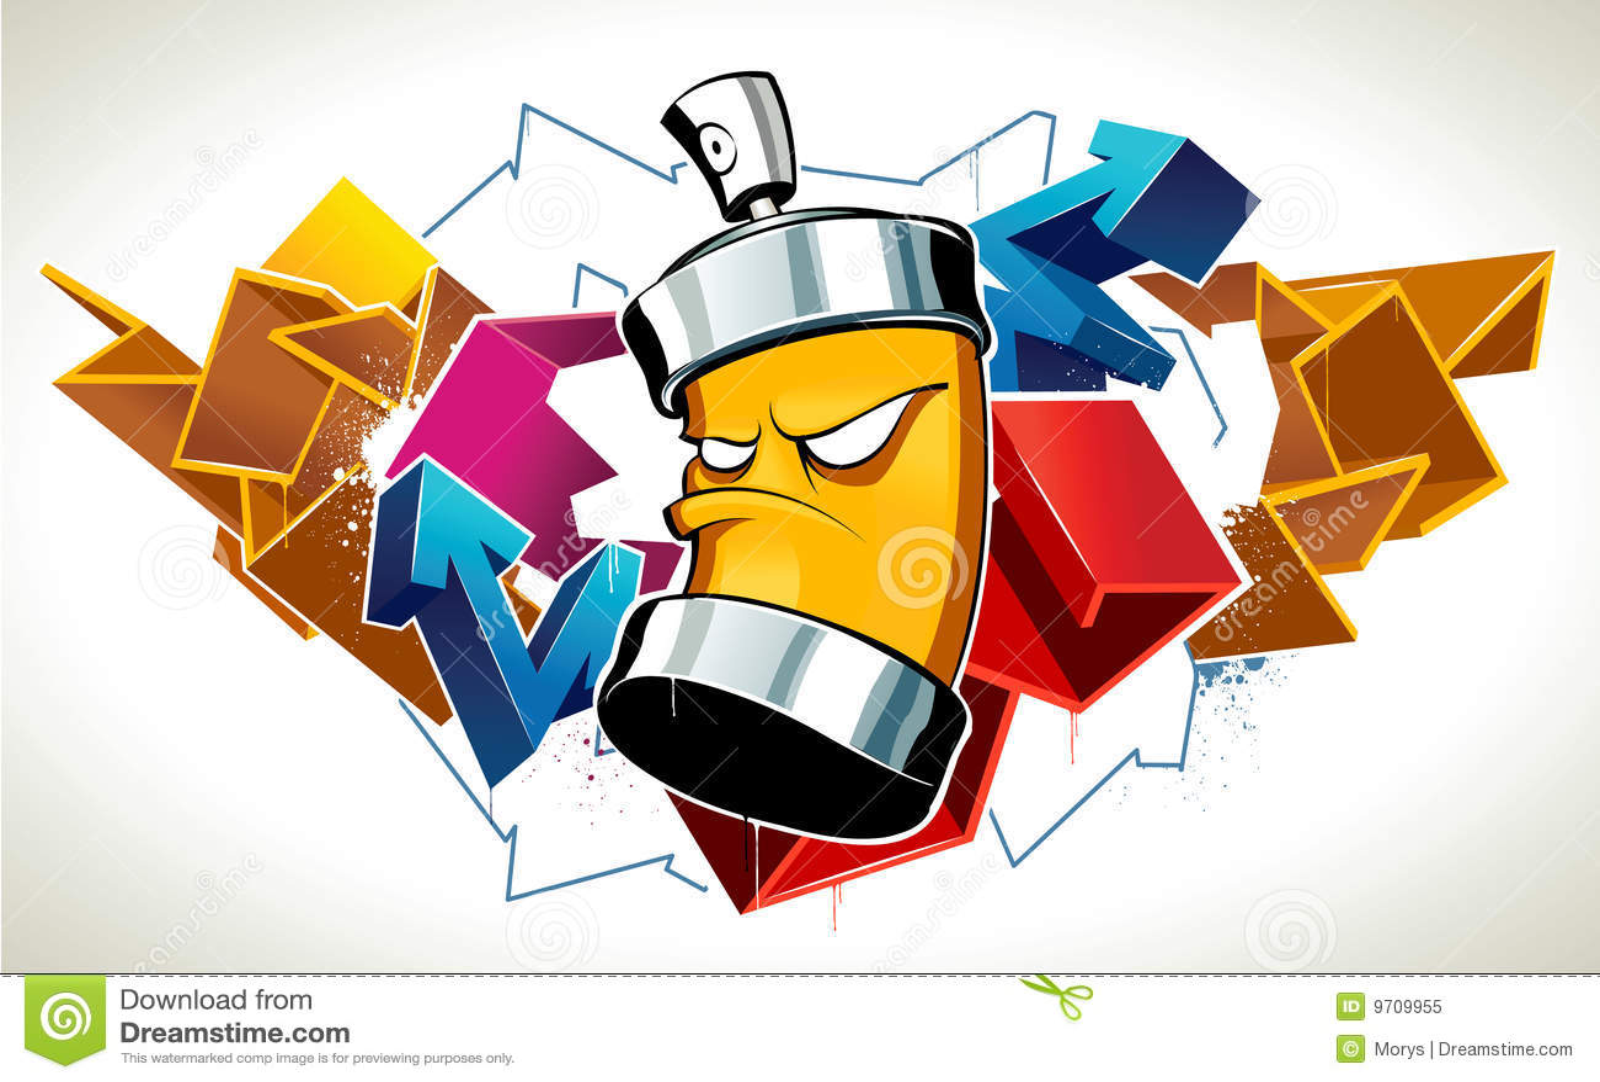 Cool Graffiti Royalty Free Stock Photo Image 9709955